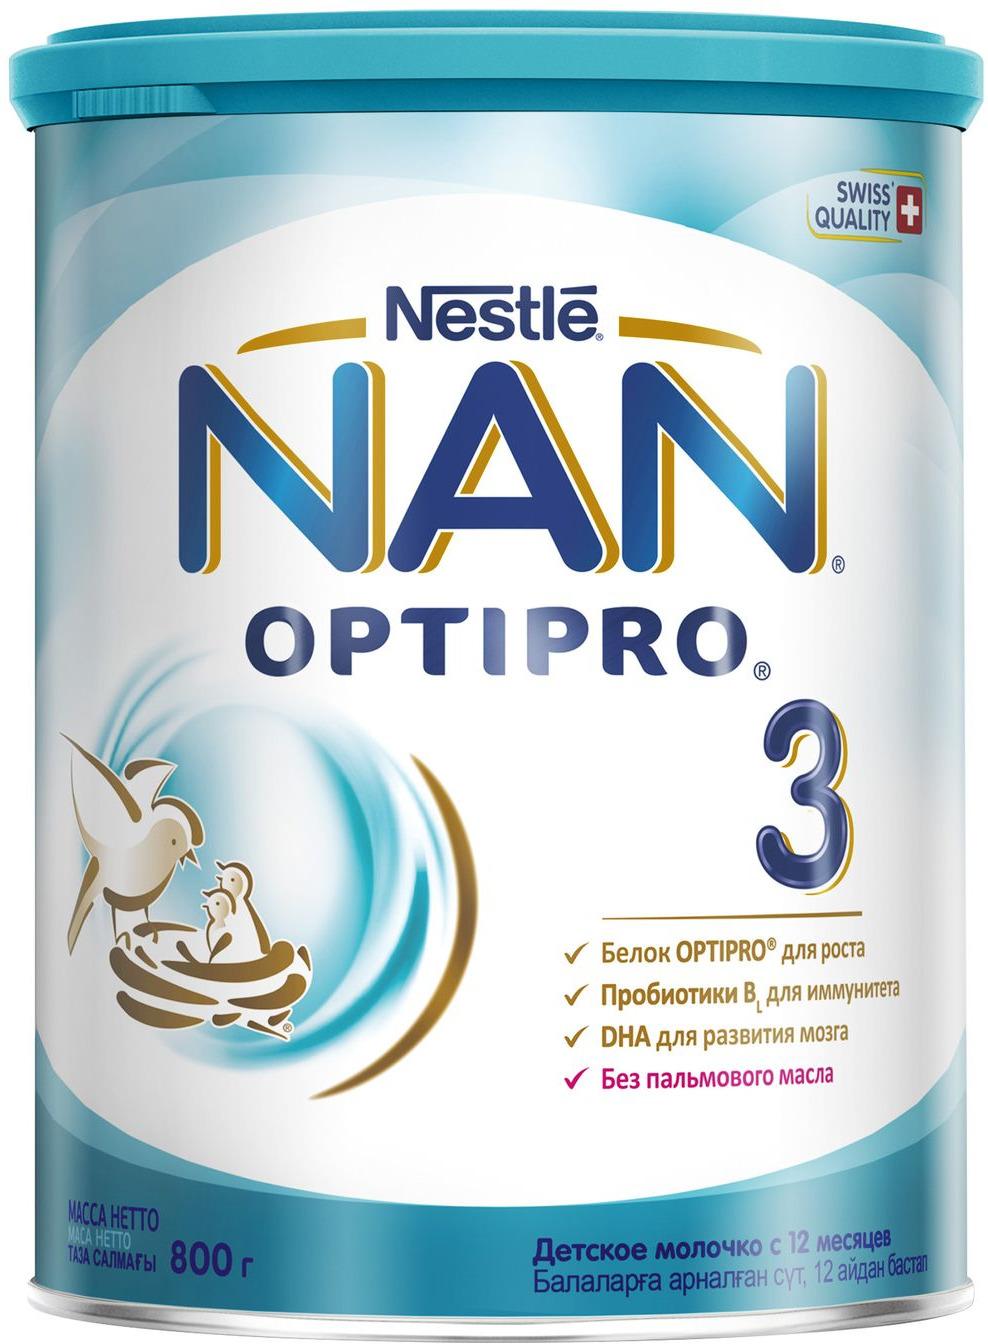 NAN 3 OPTIPRO молочко, с 12 месяцев, 800 г